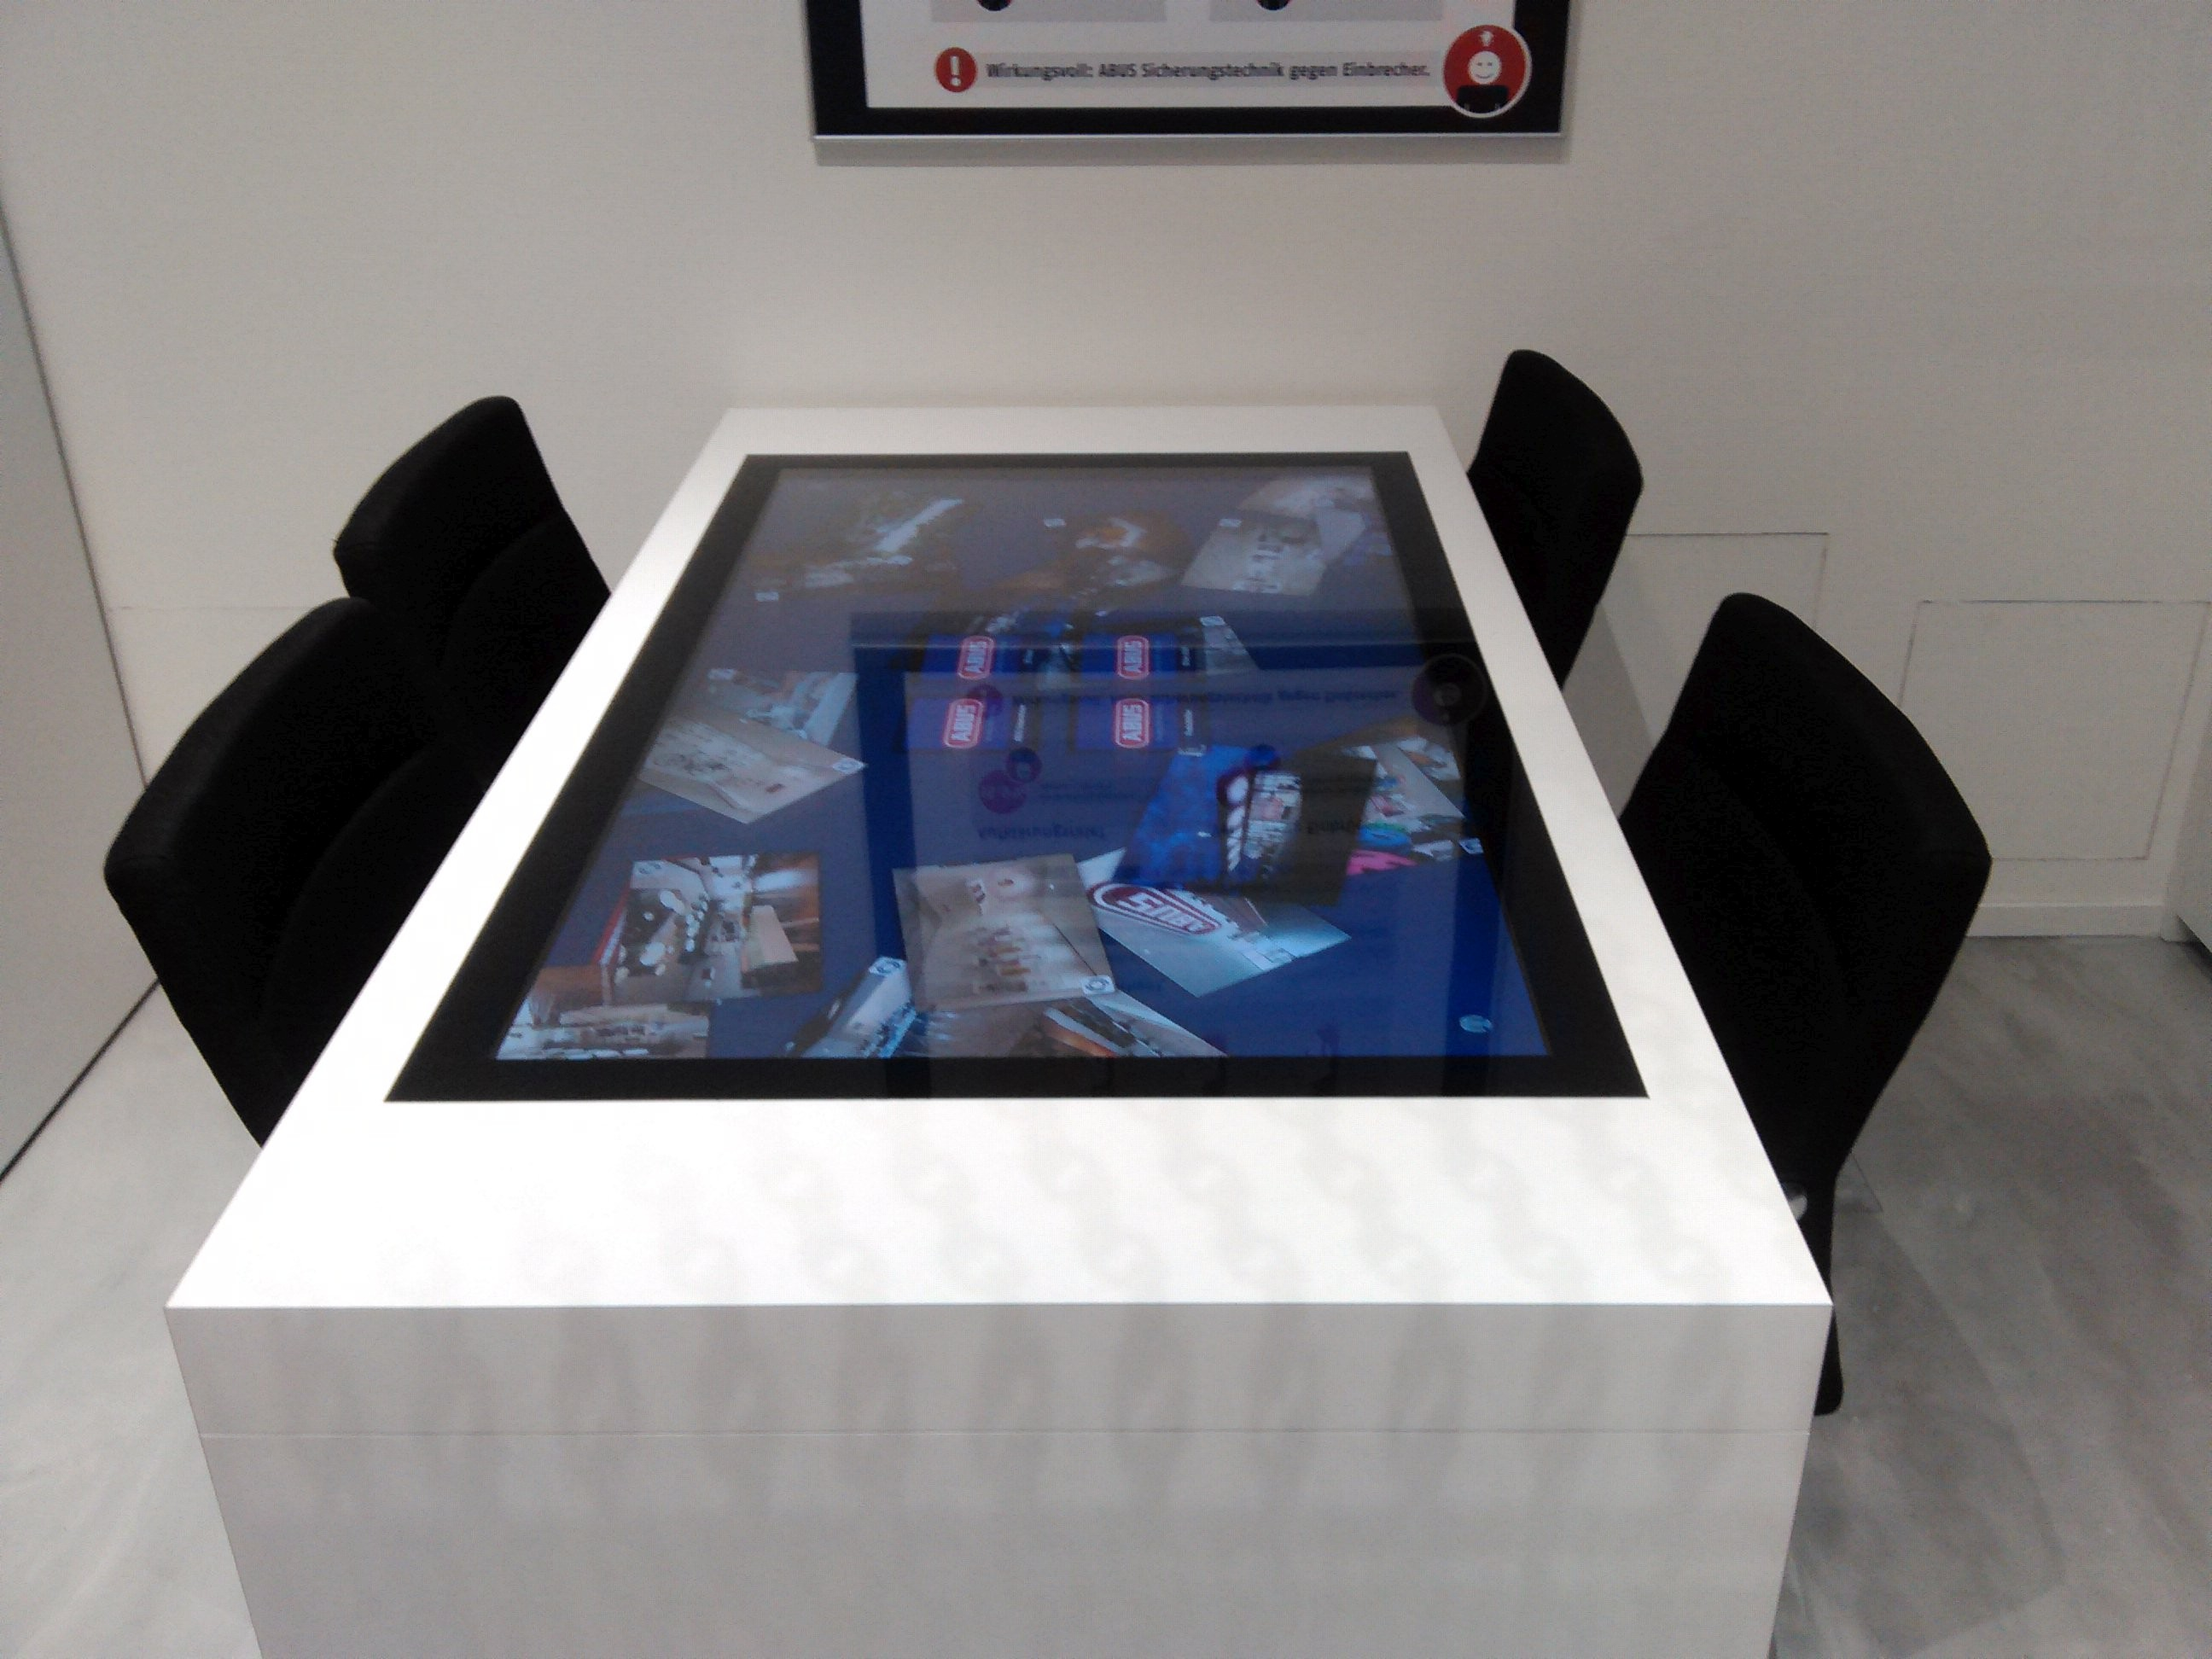 solutions interactive displays gmbh grossformatige touchl sungen. Black Bedroom Furniture Sets. Home Design Ideas